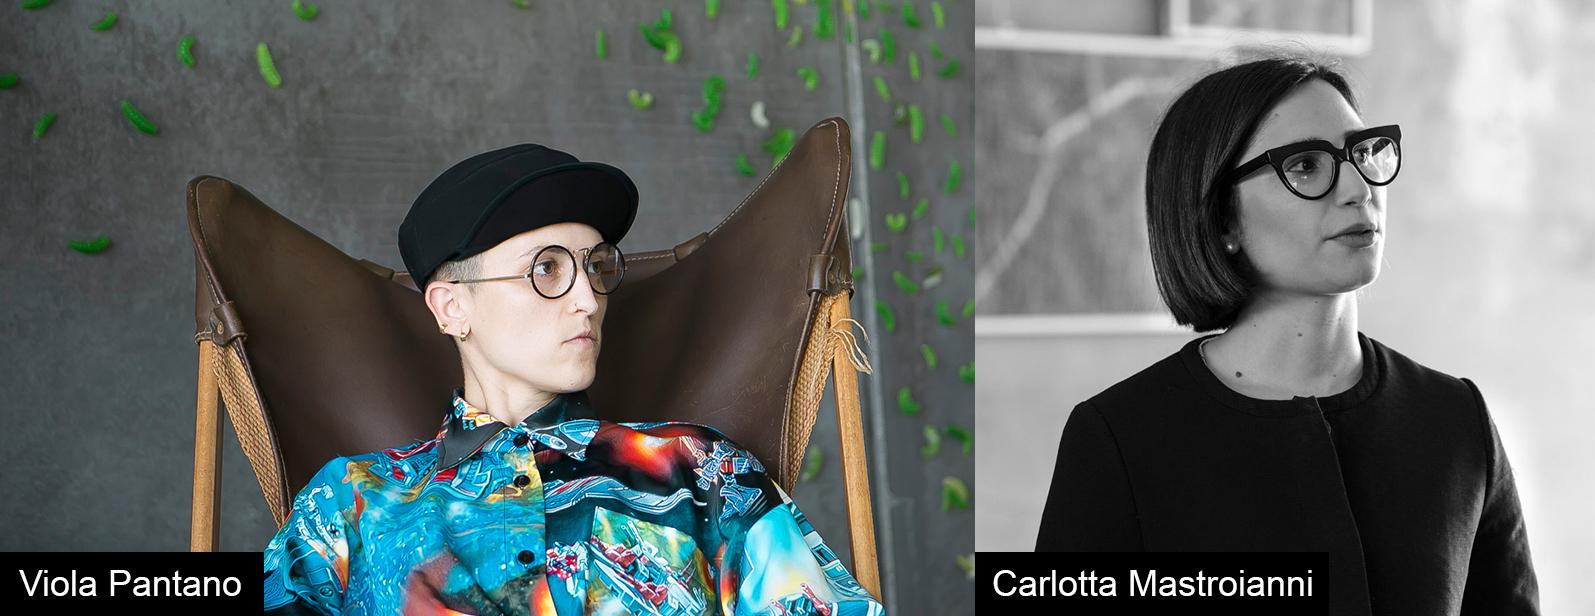 Viola Pantano & Carlotta Mastroianni [ADADVISOR]